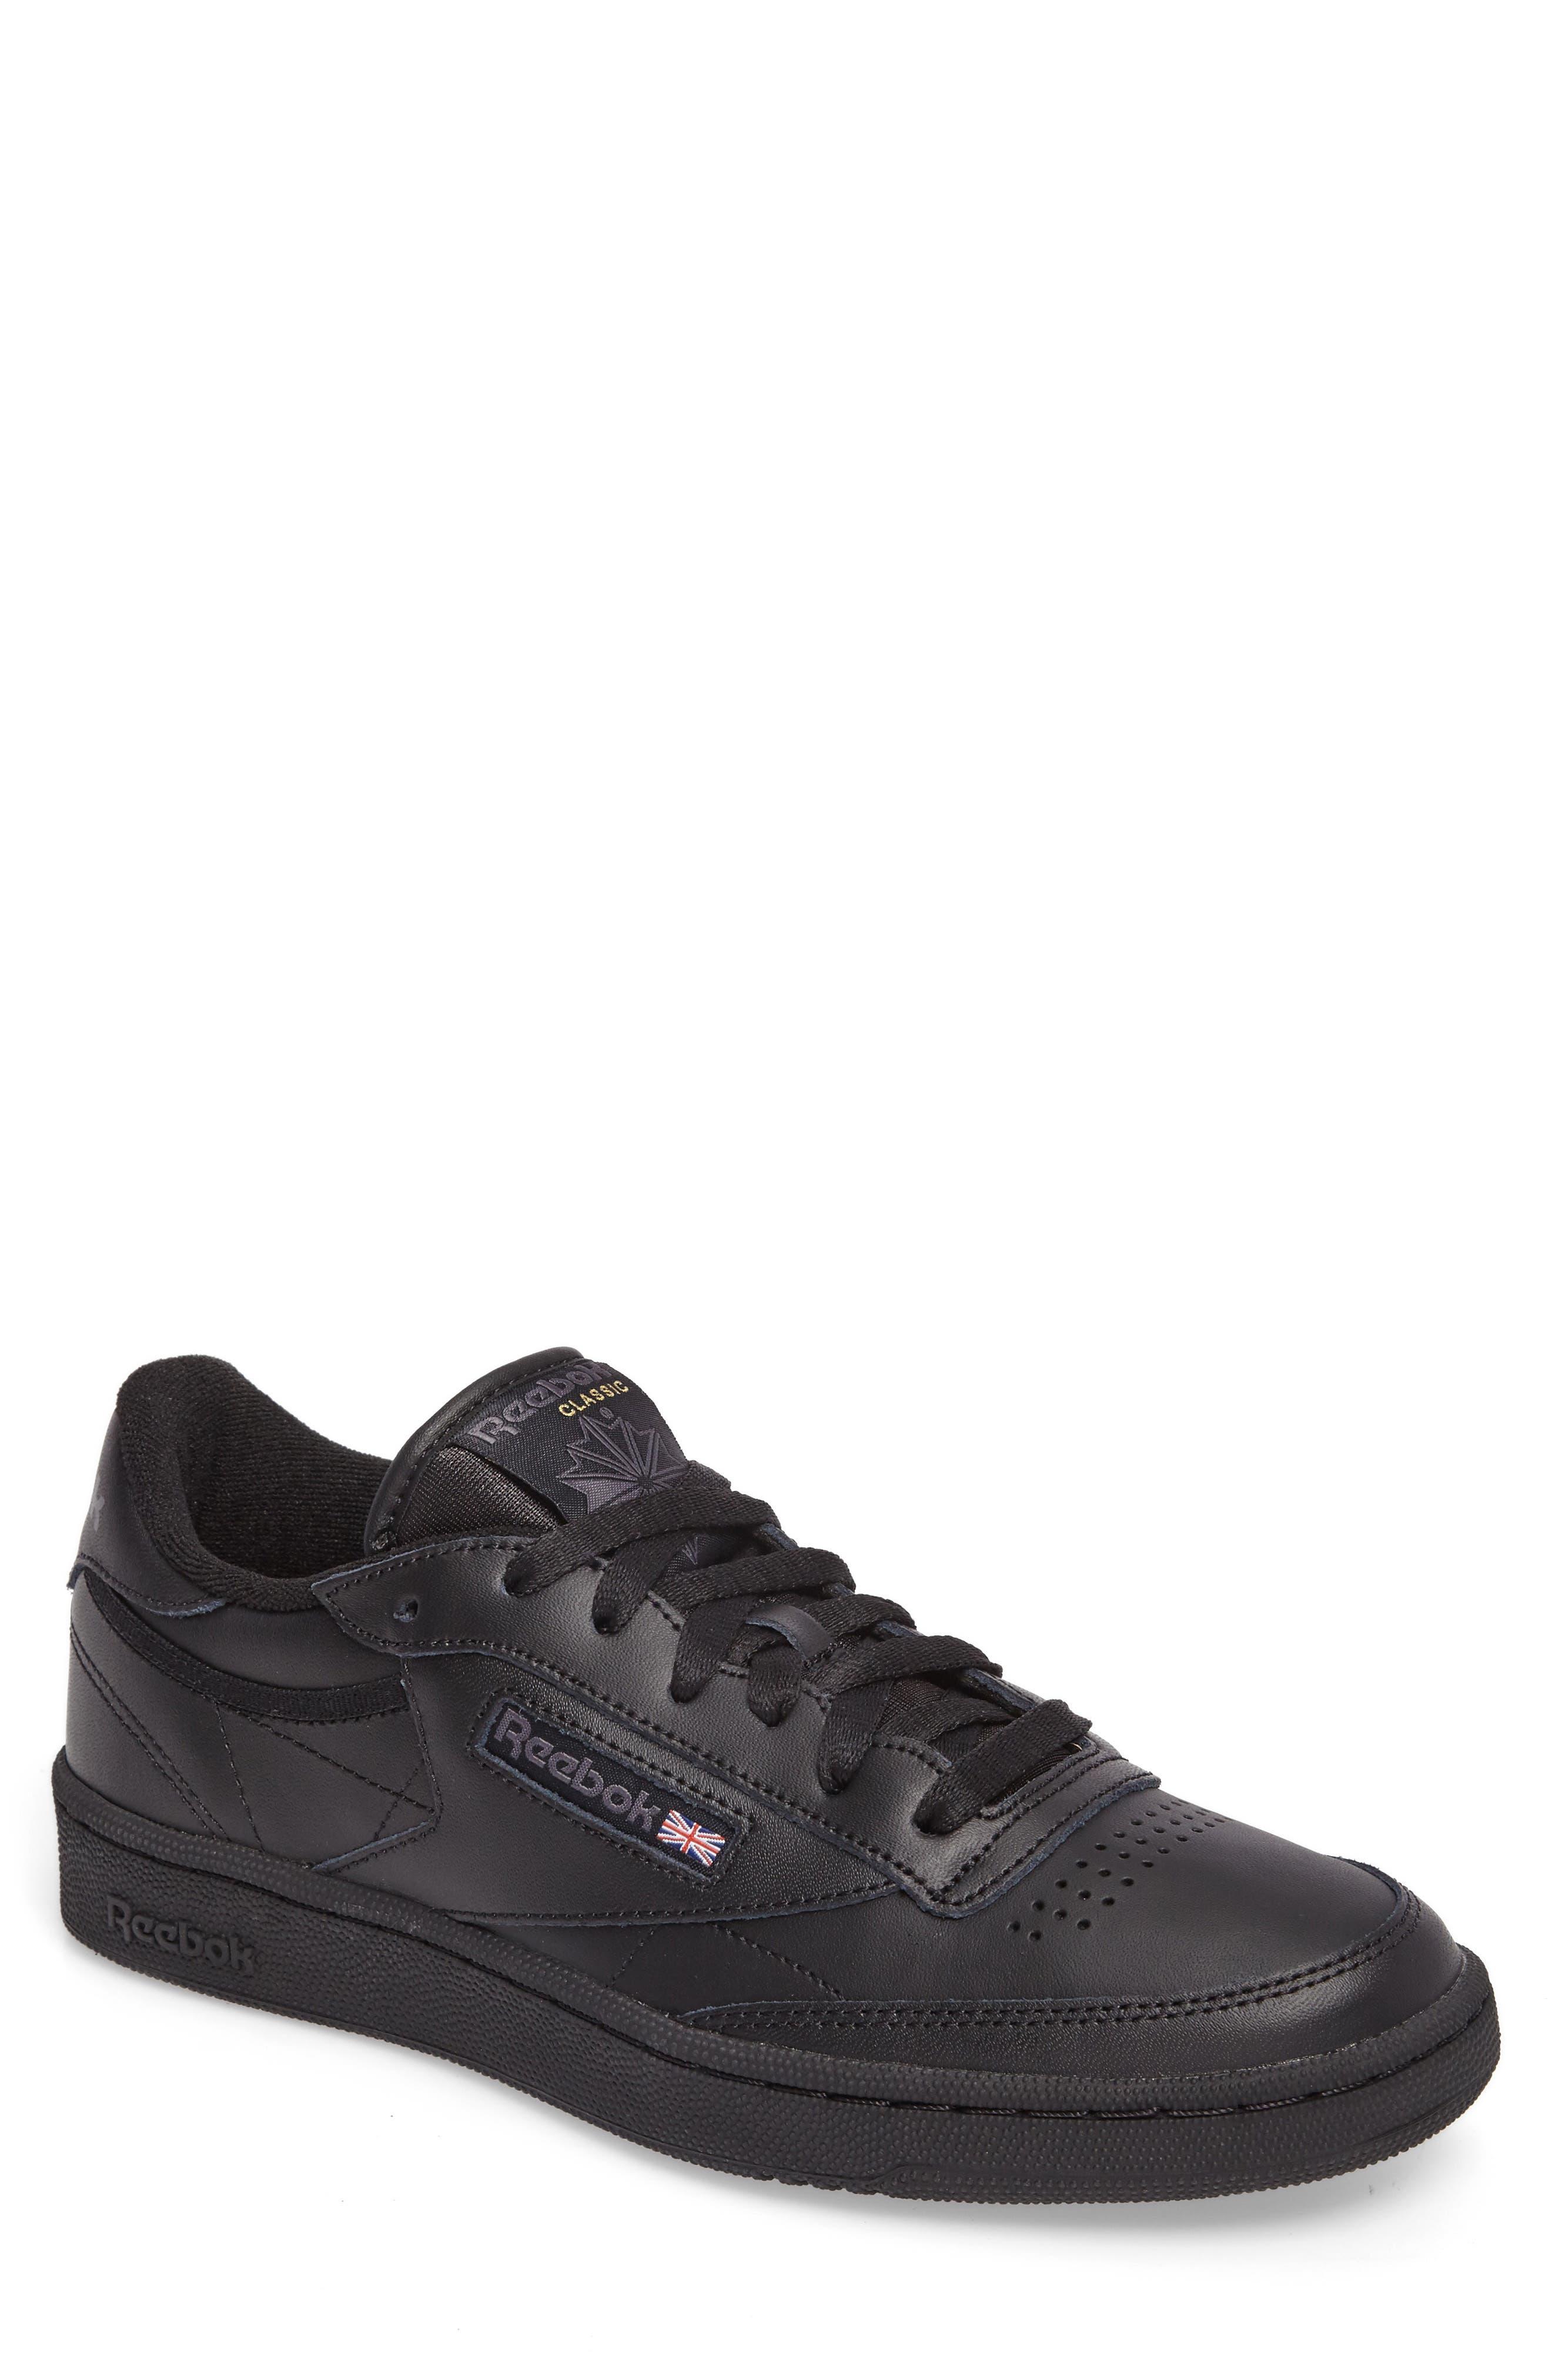 Club C 85 Sneaker,                         Main,                         color, BLACK/ CHARCOAL